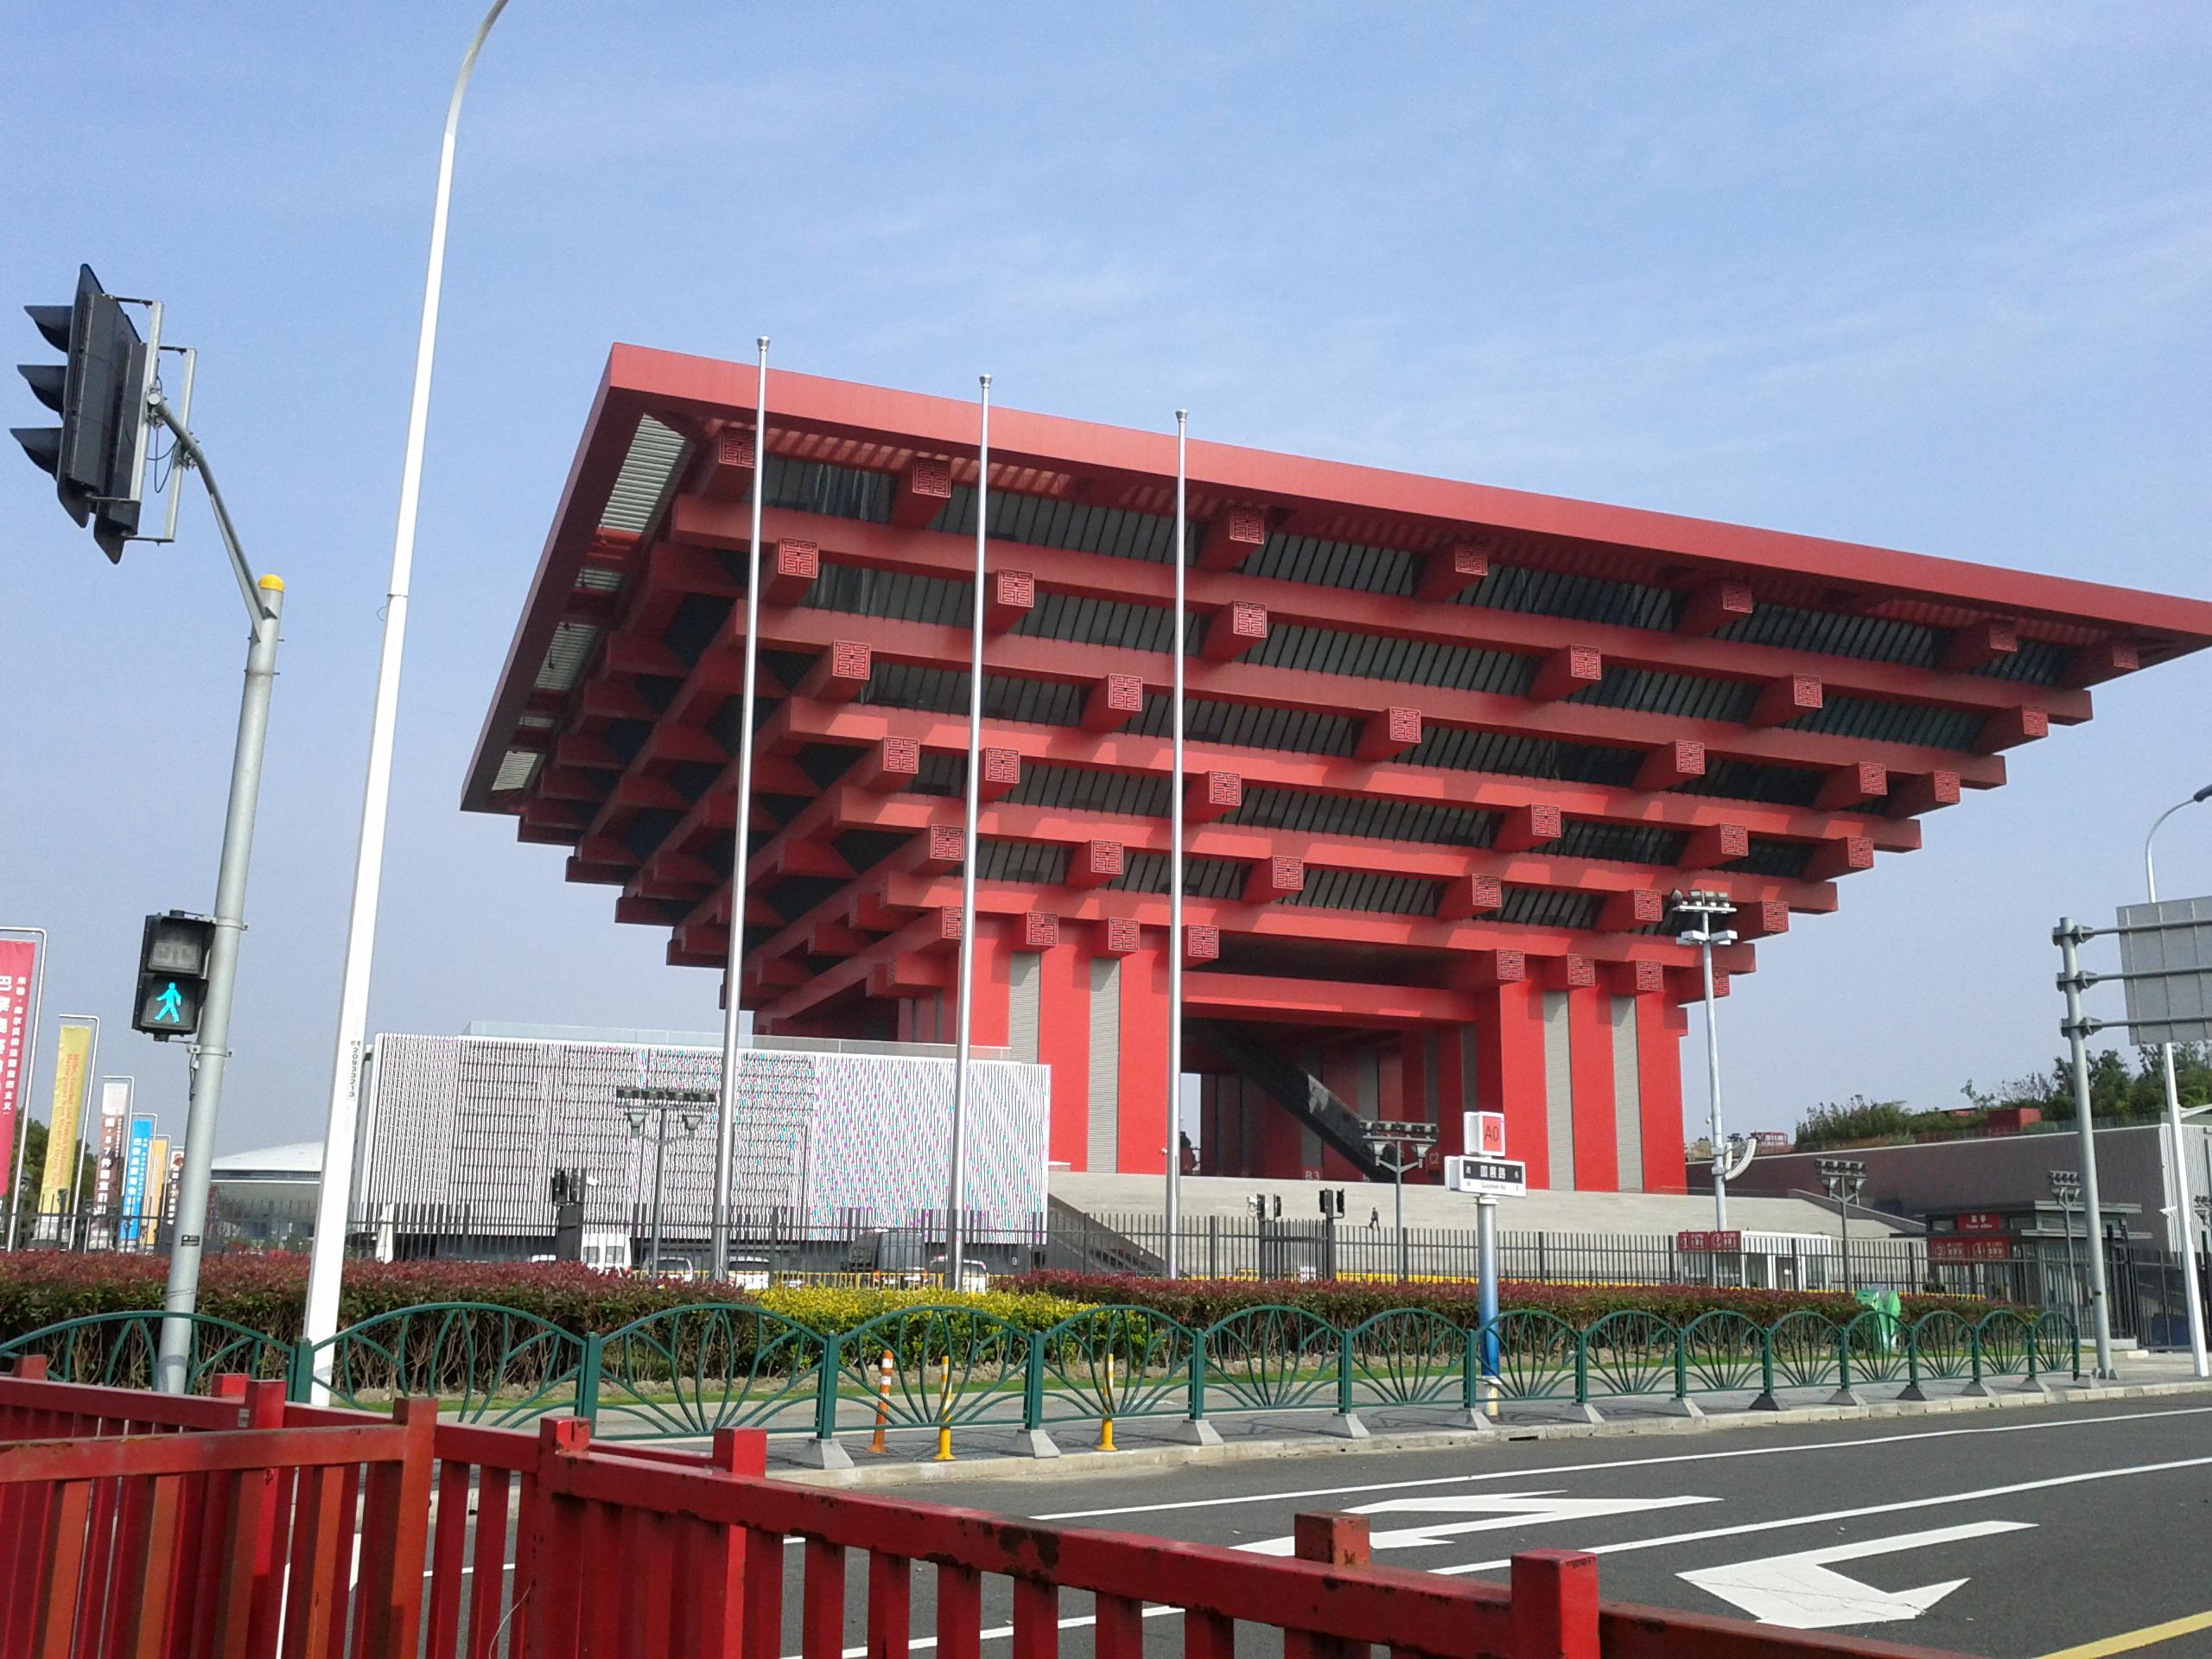 Beijing Urban Planning Exhibition Hall